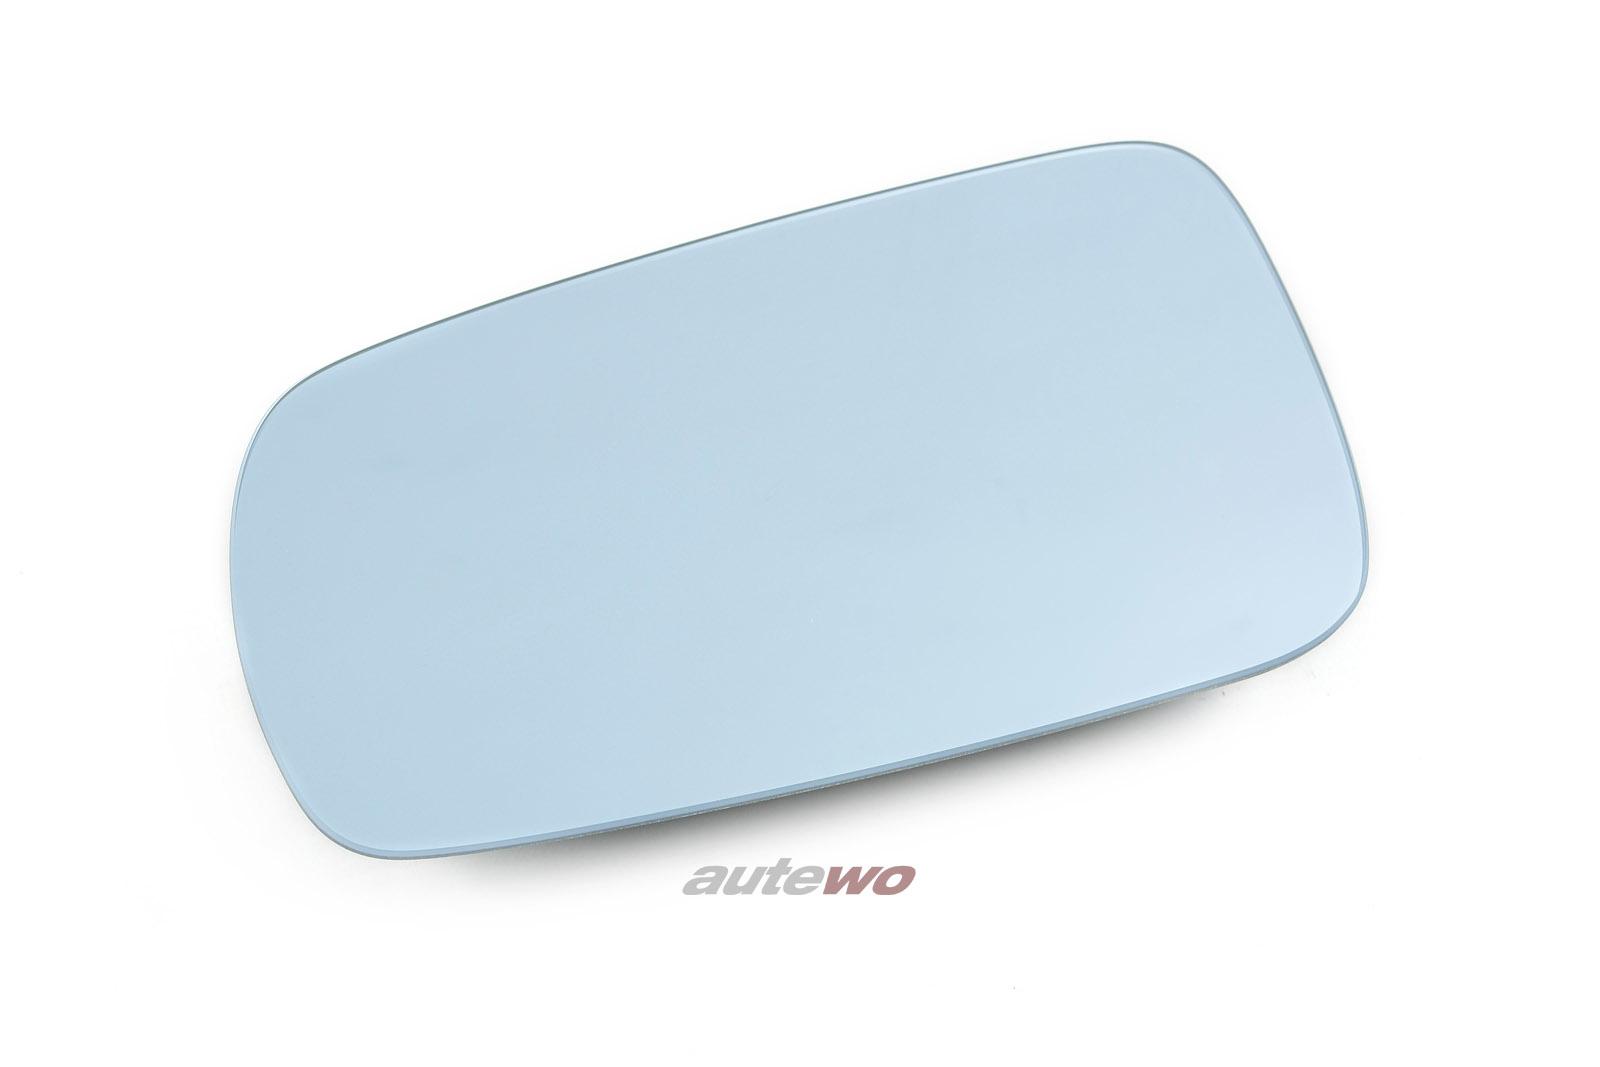 4A1857535AD NEU Audi A3 8L/A4 B5/A6 C4/4B/A8 D2 Spiegelglas plan Links